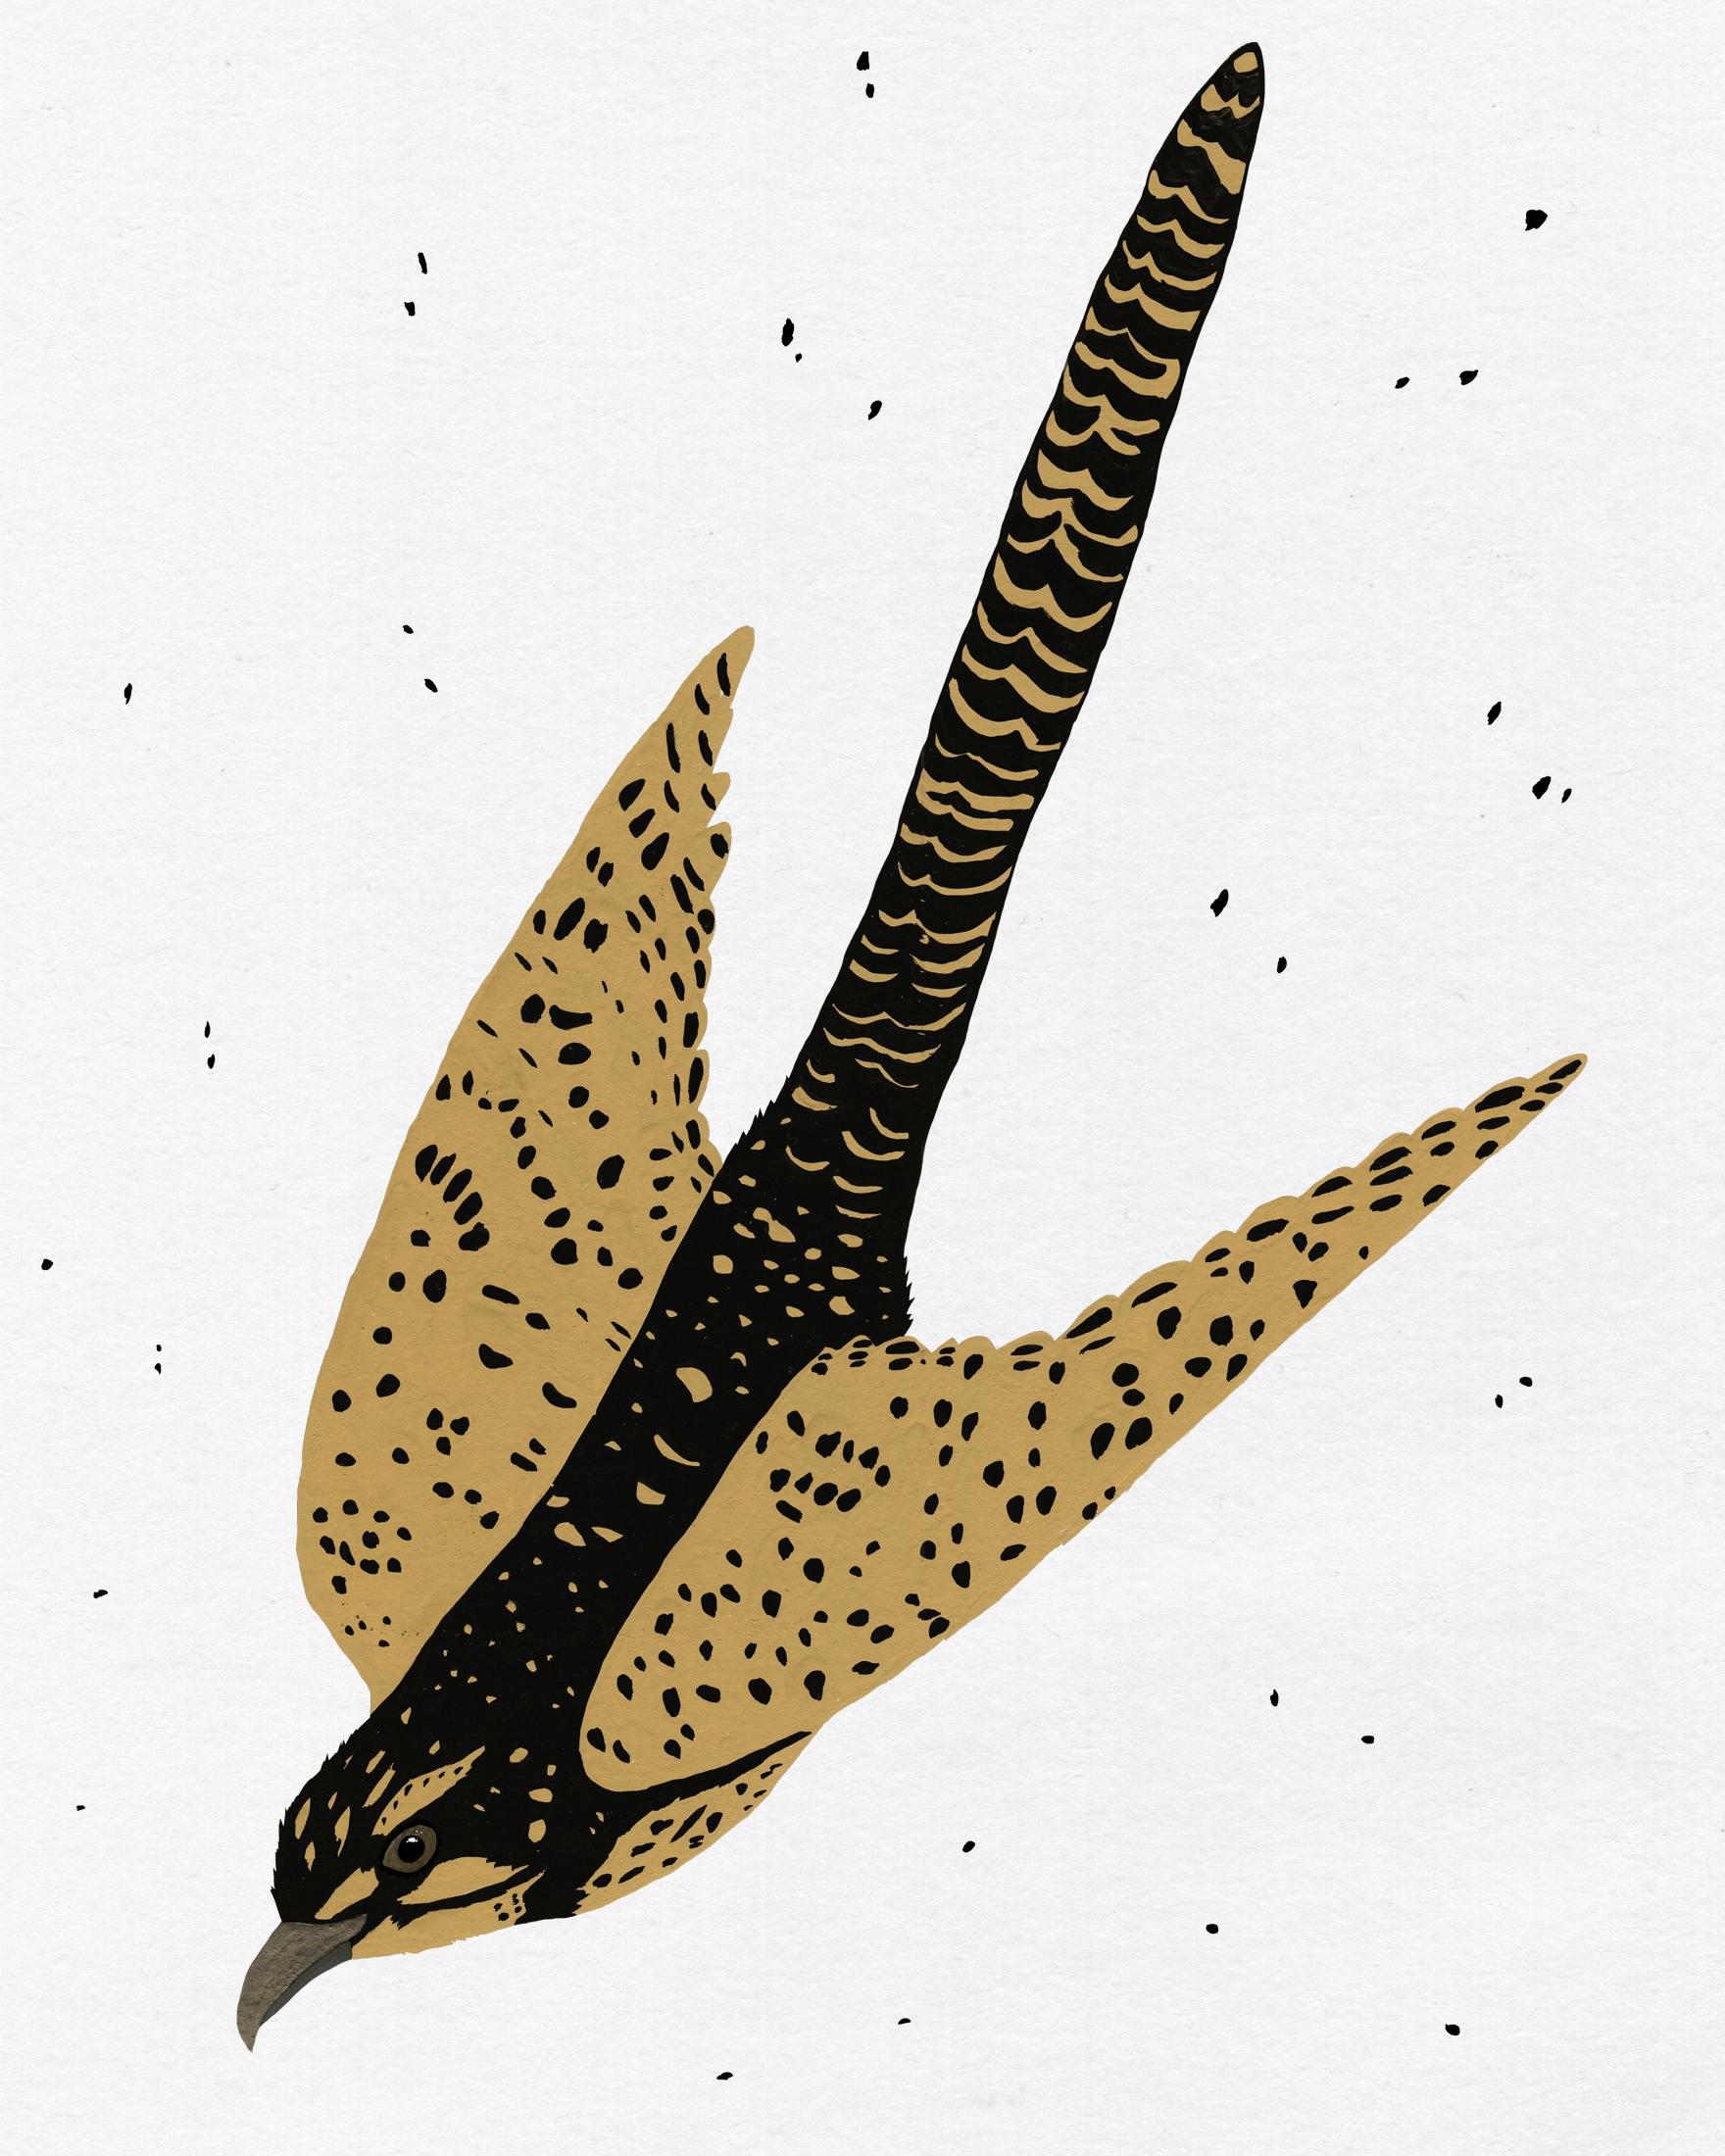 patterned bird series -flying cuckoo